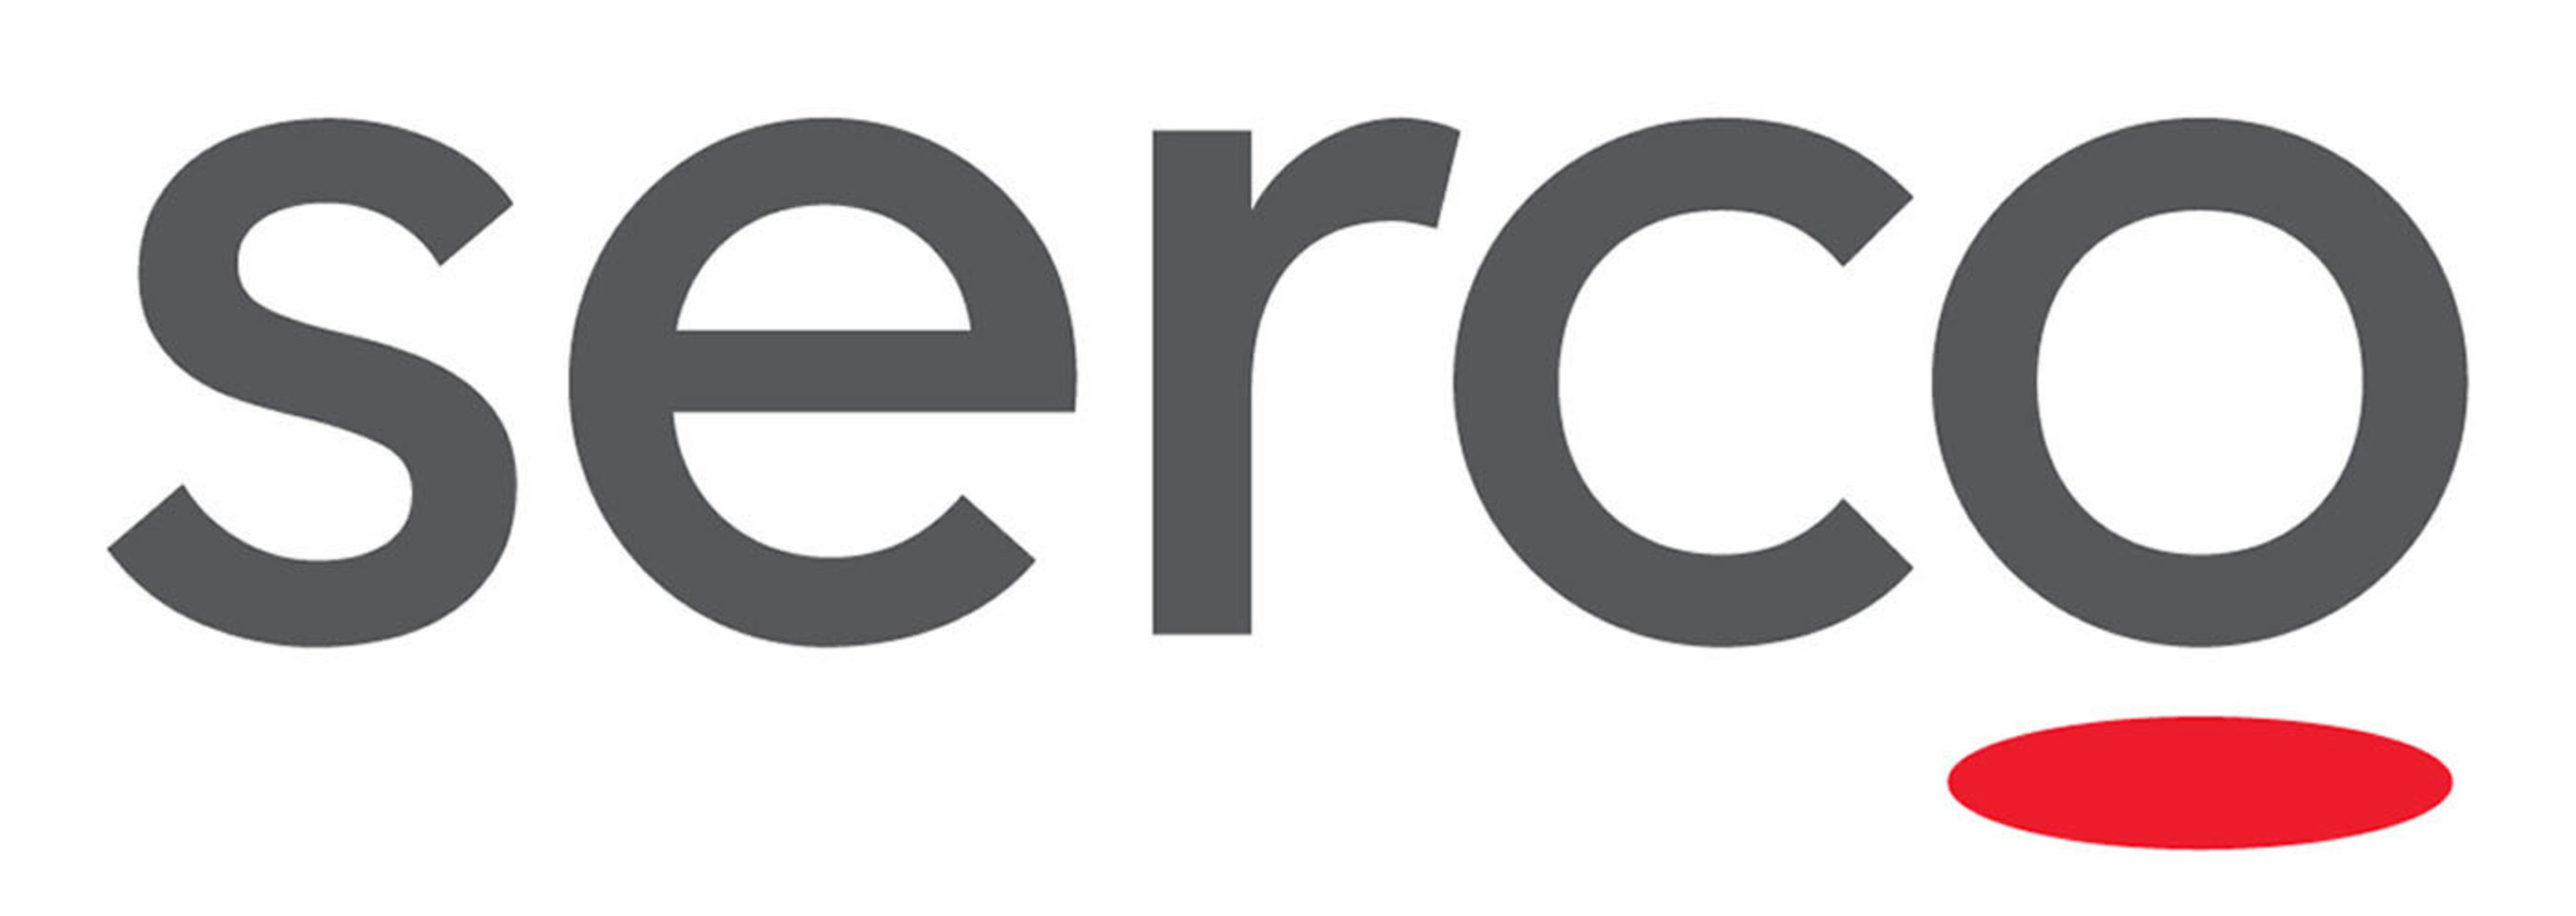 Serco Inc. logo